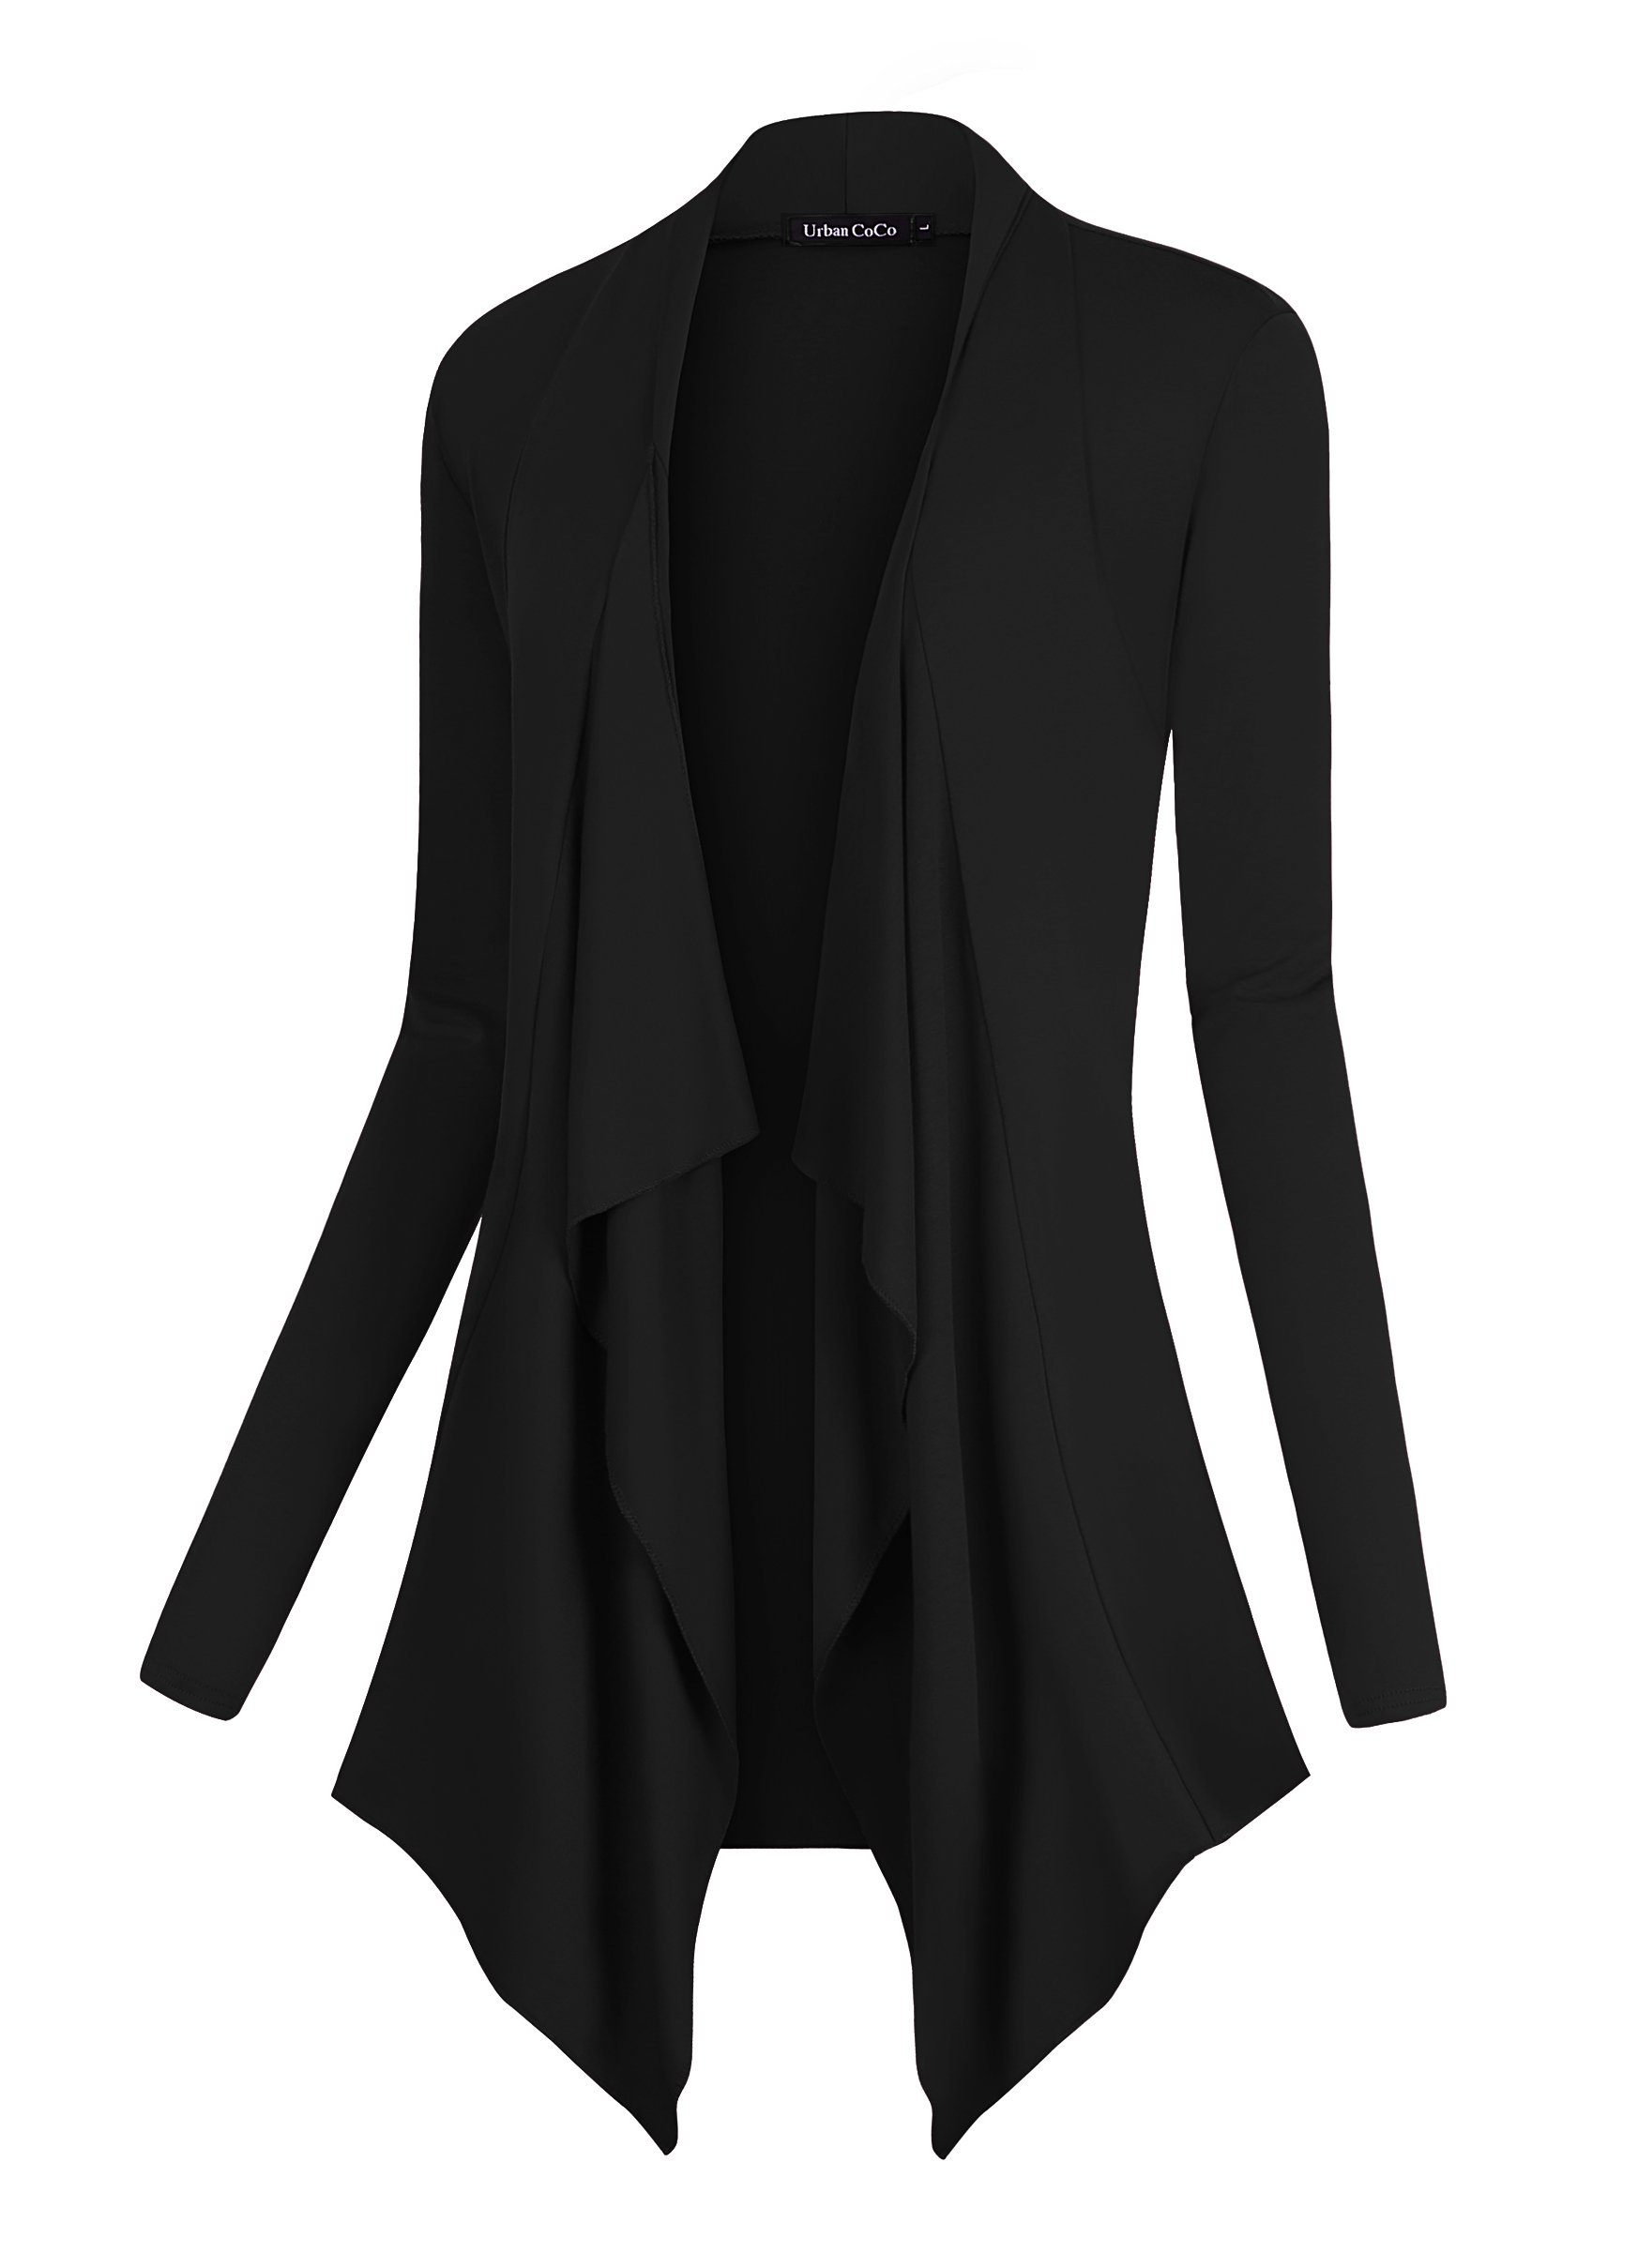 Urban CoCo Women's Drape Front Open Cardigan Long Sleeve Irregular Hem (M, Black)